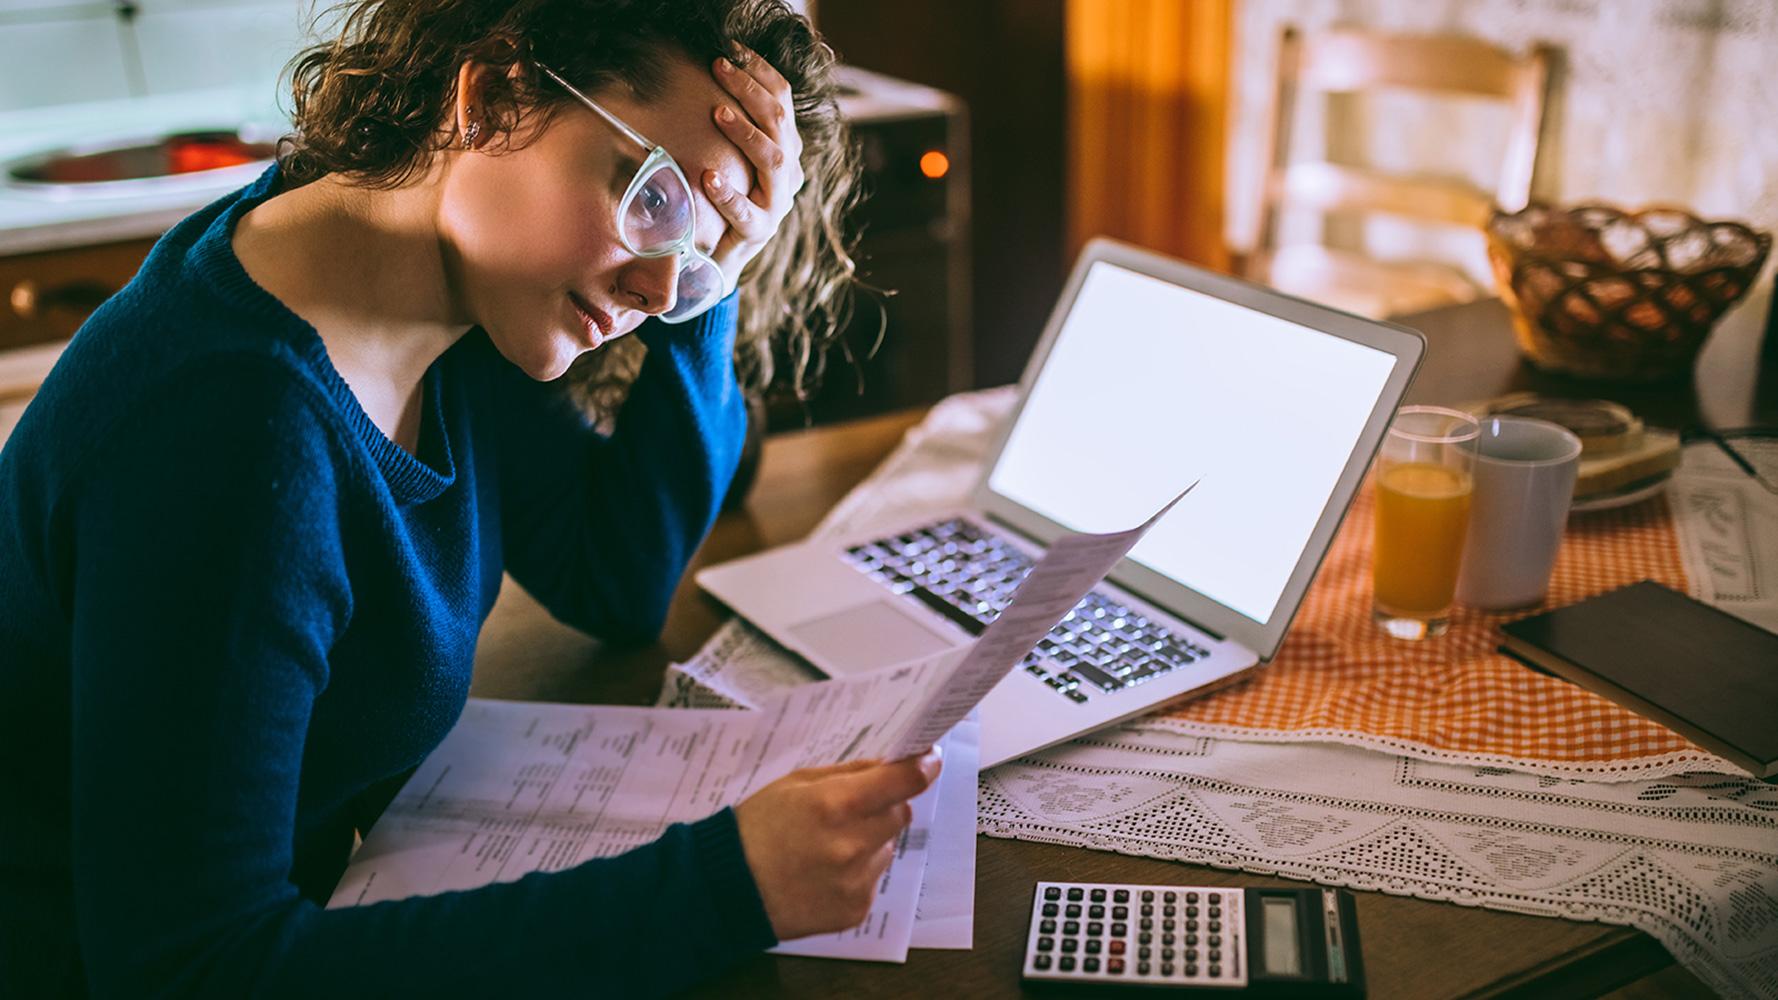 Student Loan repayment